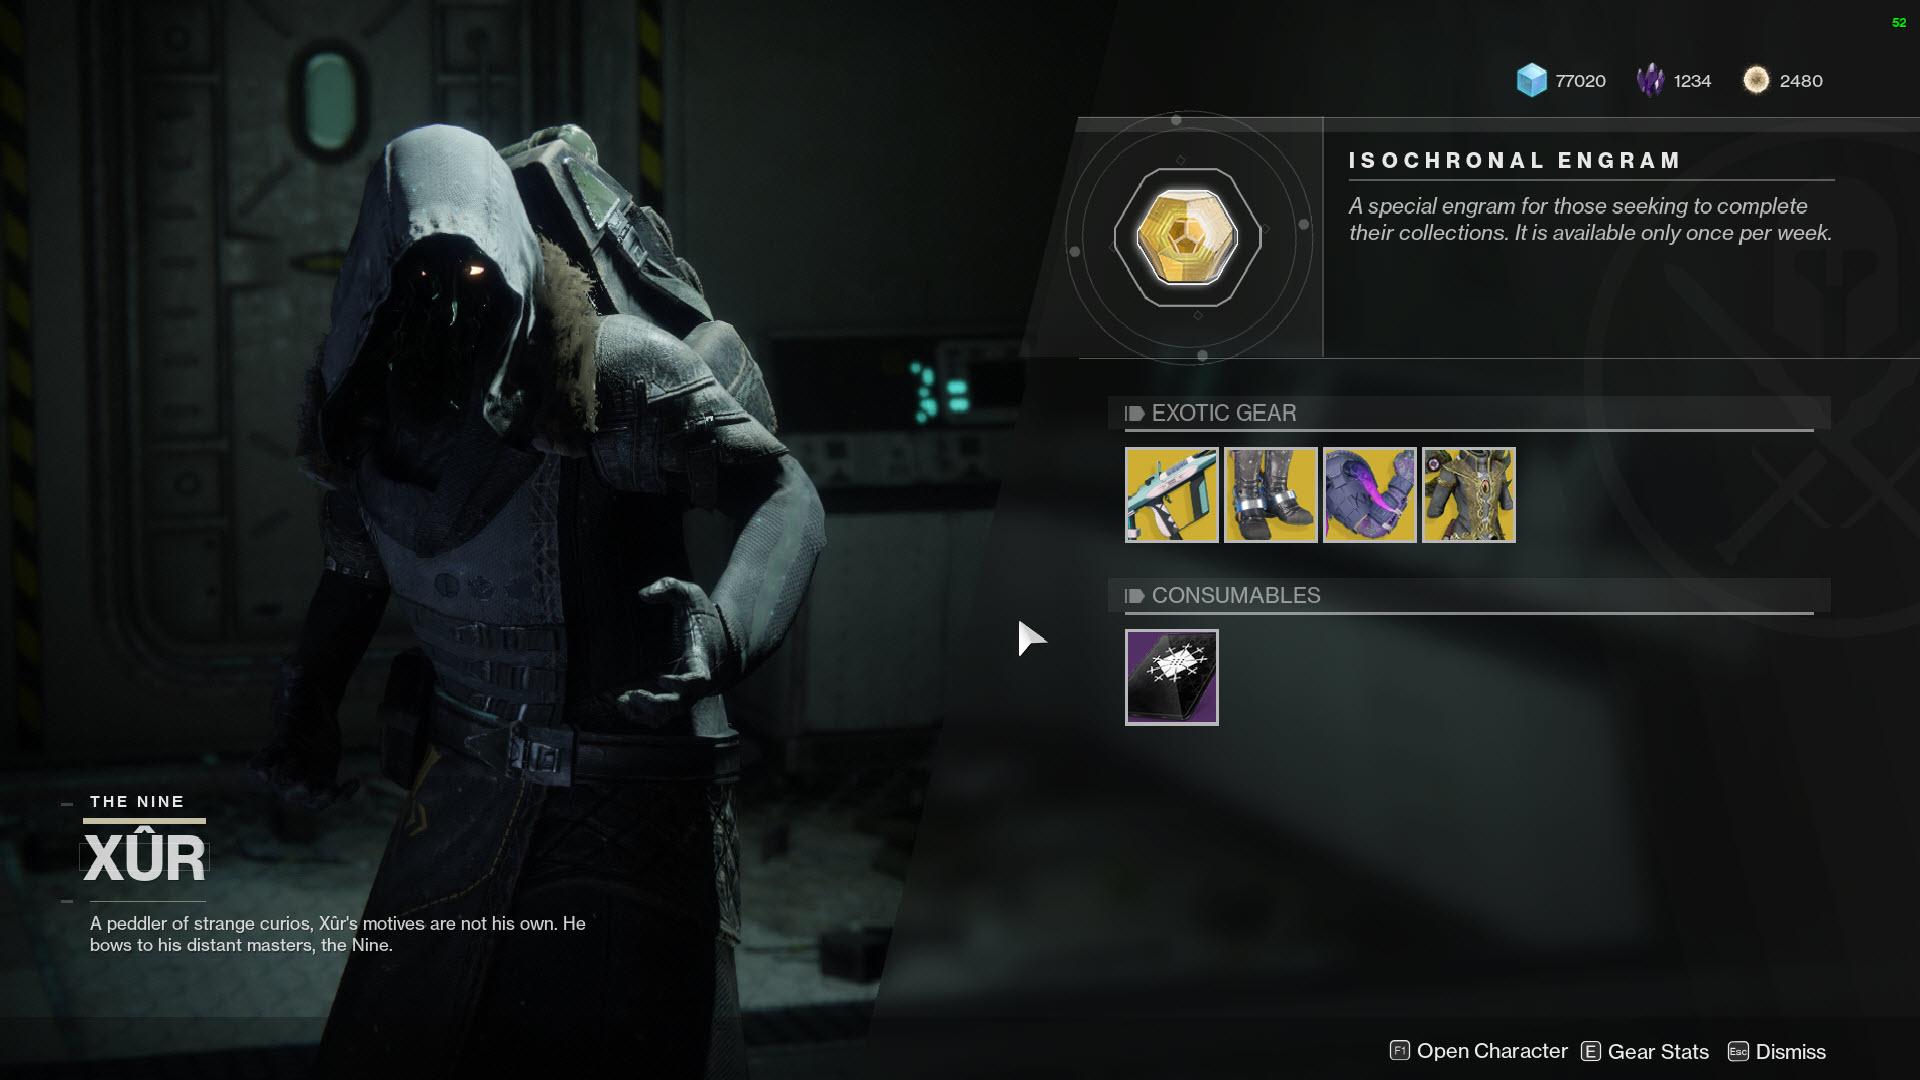 Destiny 2 Xur Location And Inventory For Dec